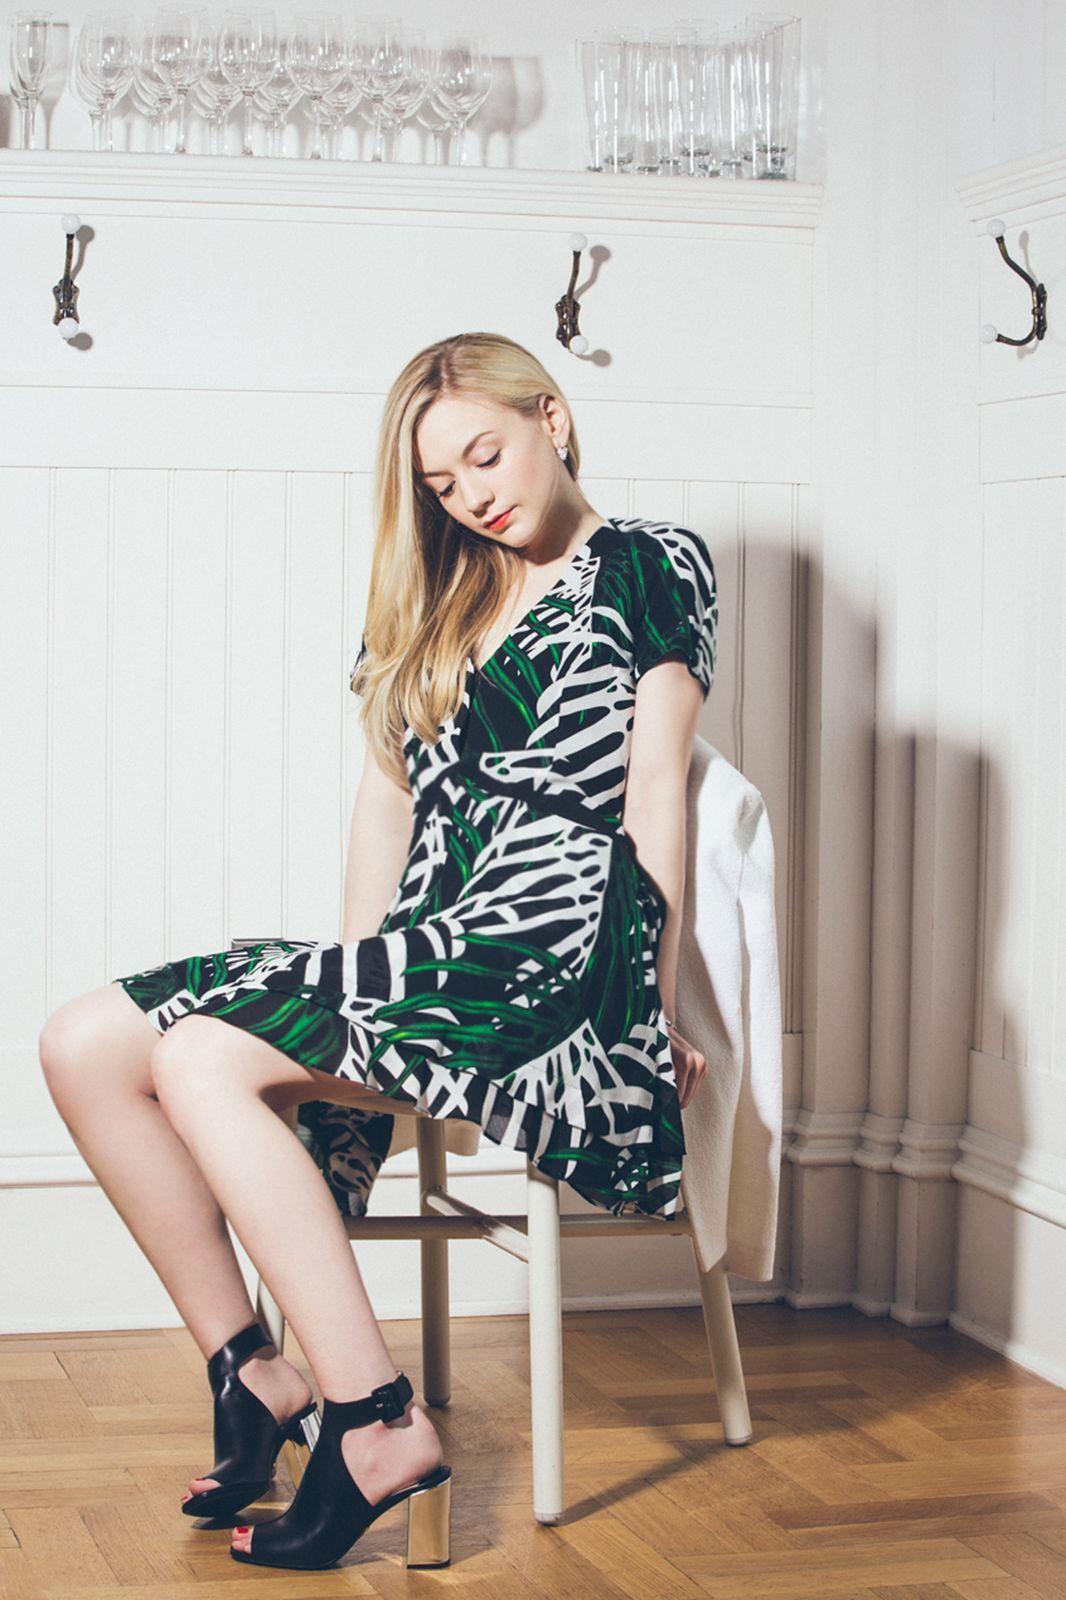 Wallpaper Face Model Collage Lauren Cohan Fashion Ultrawide